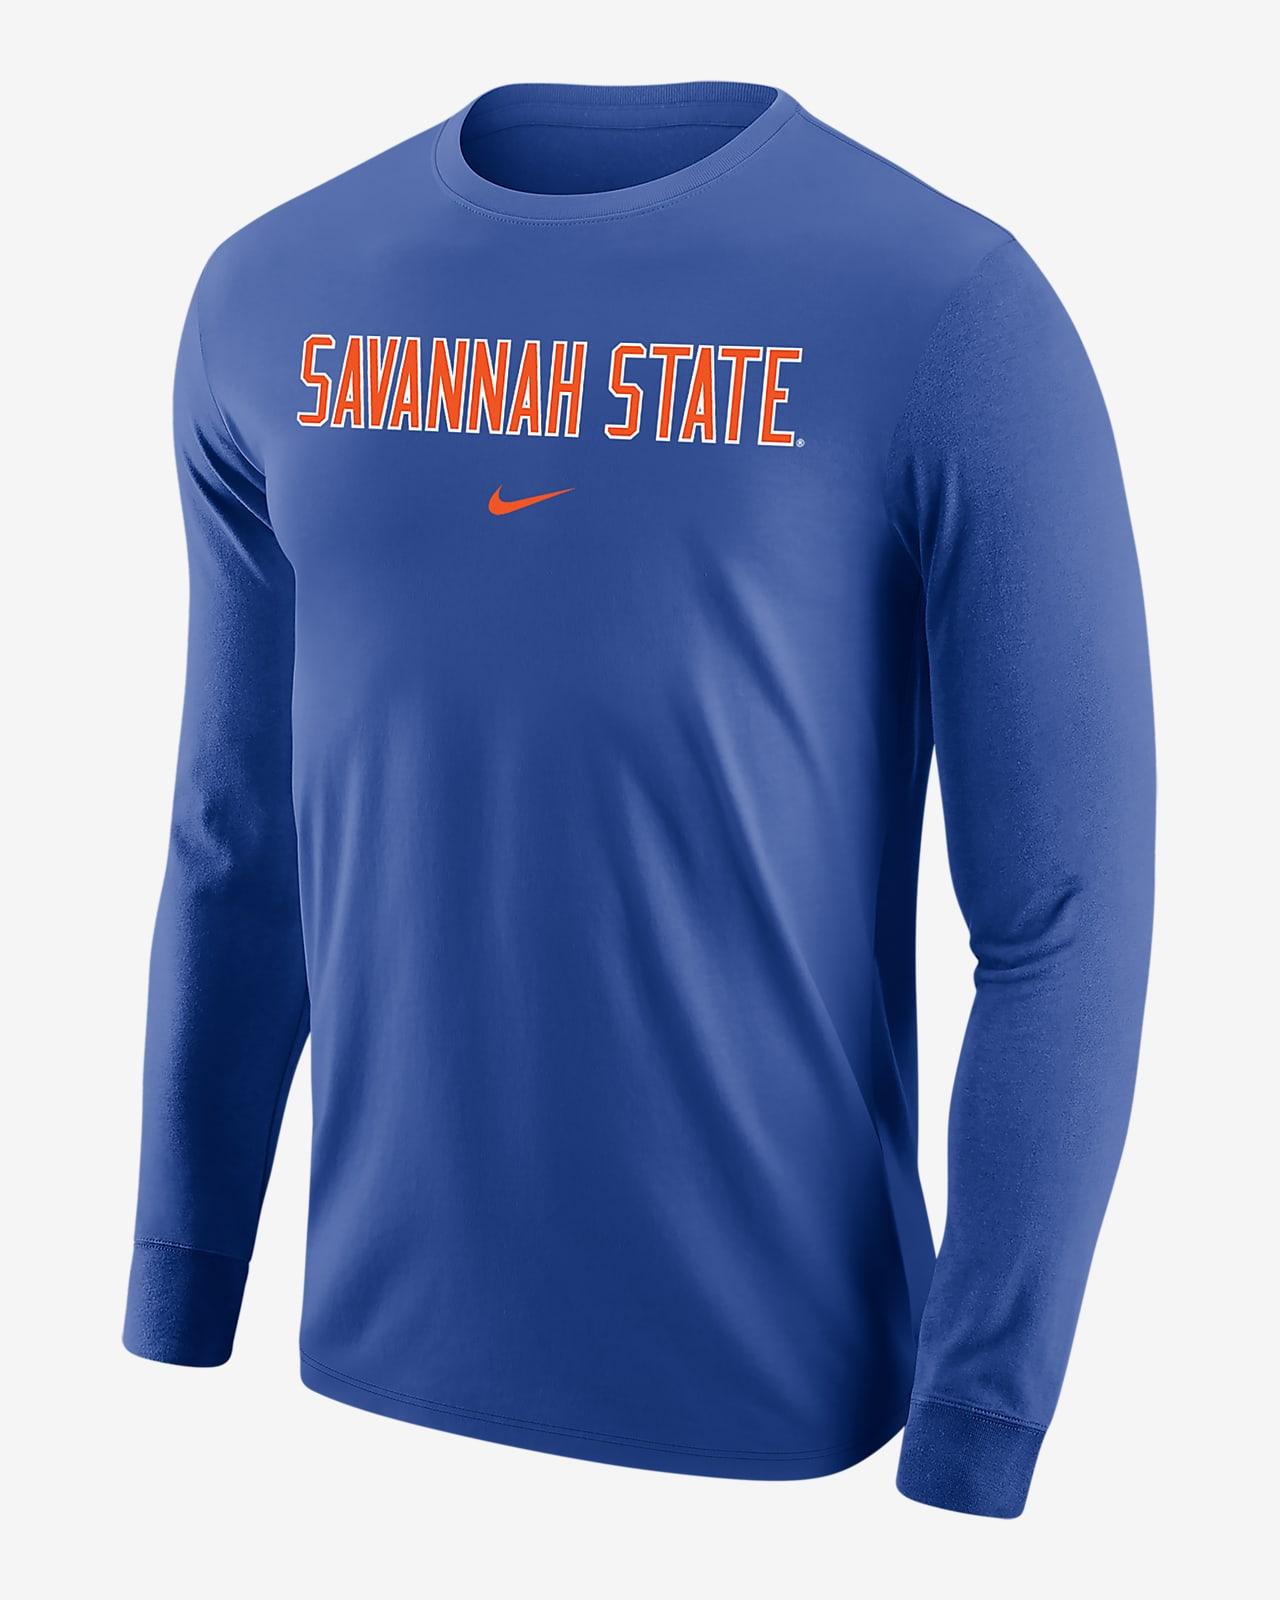 Nike College (Savannah State) Men's Long-Sleeve T-Shirt